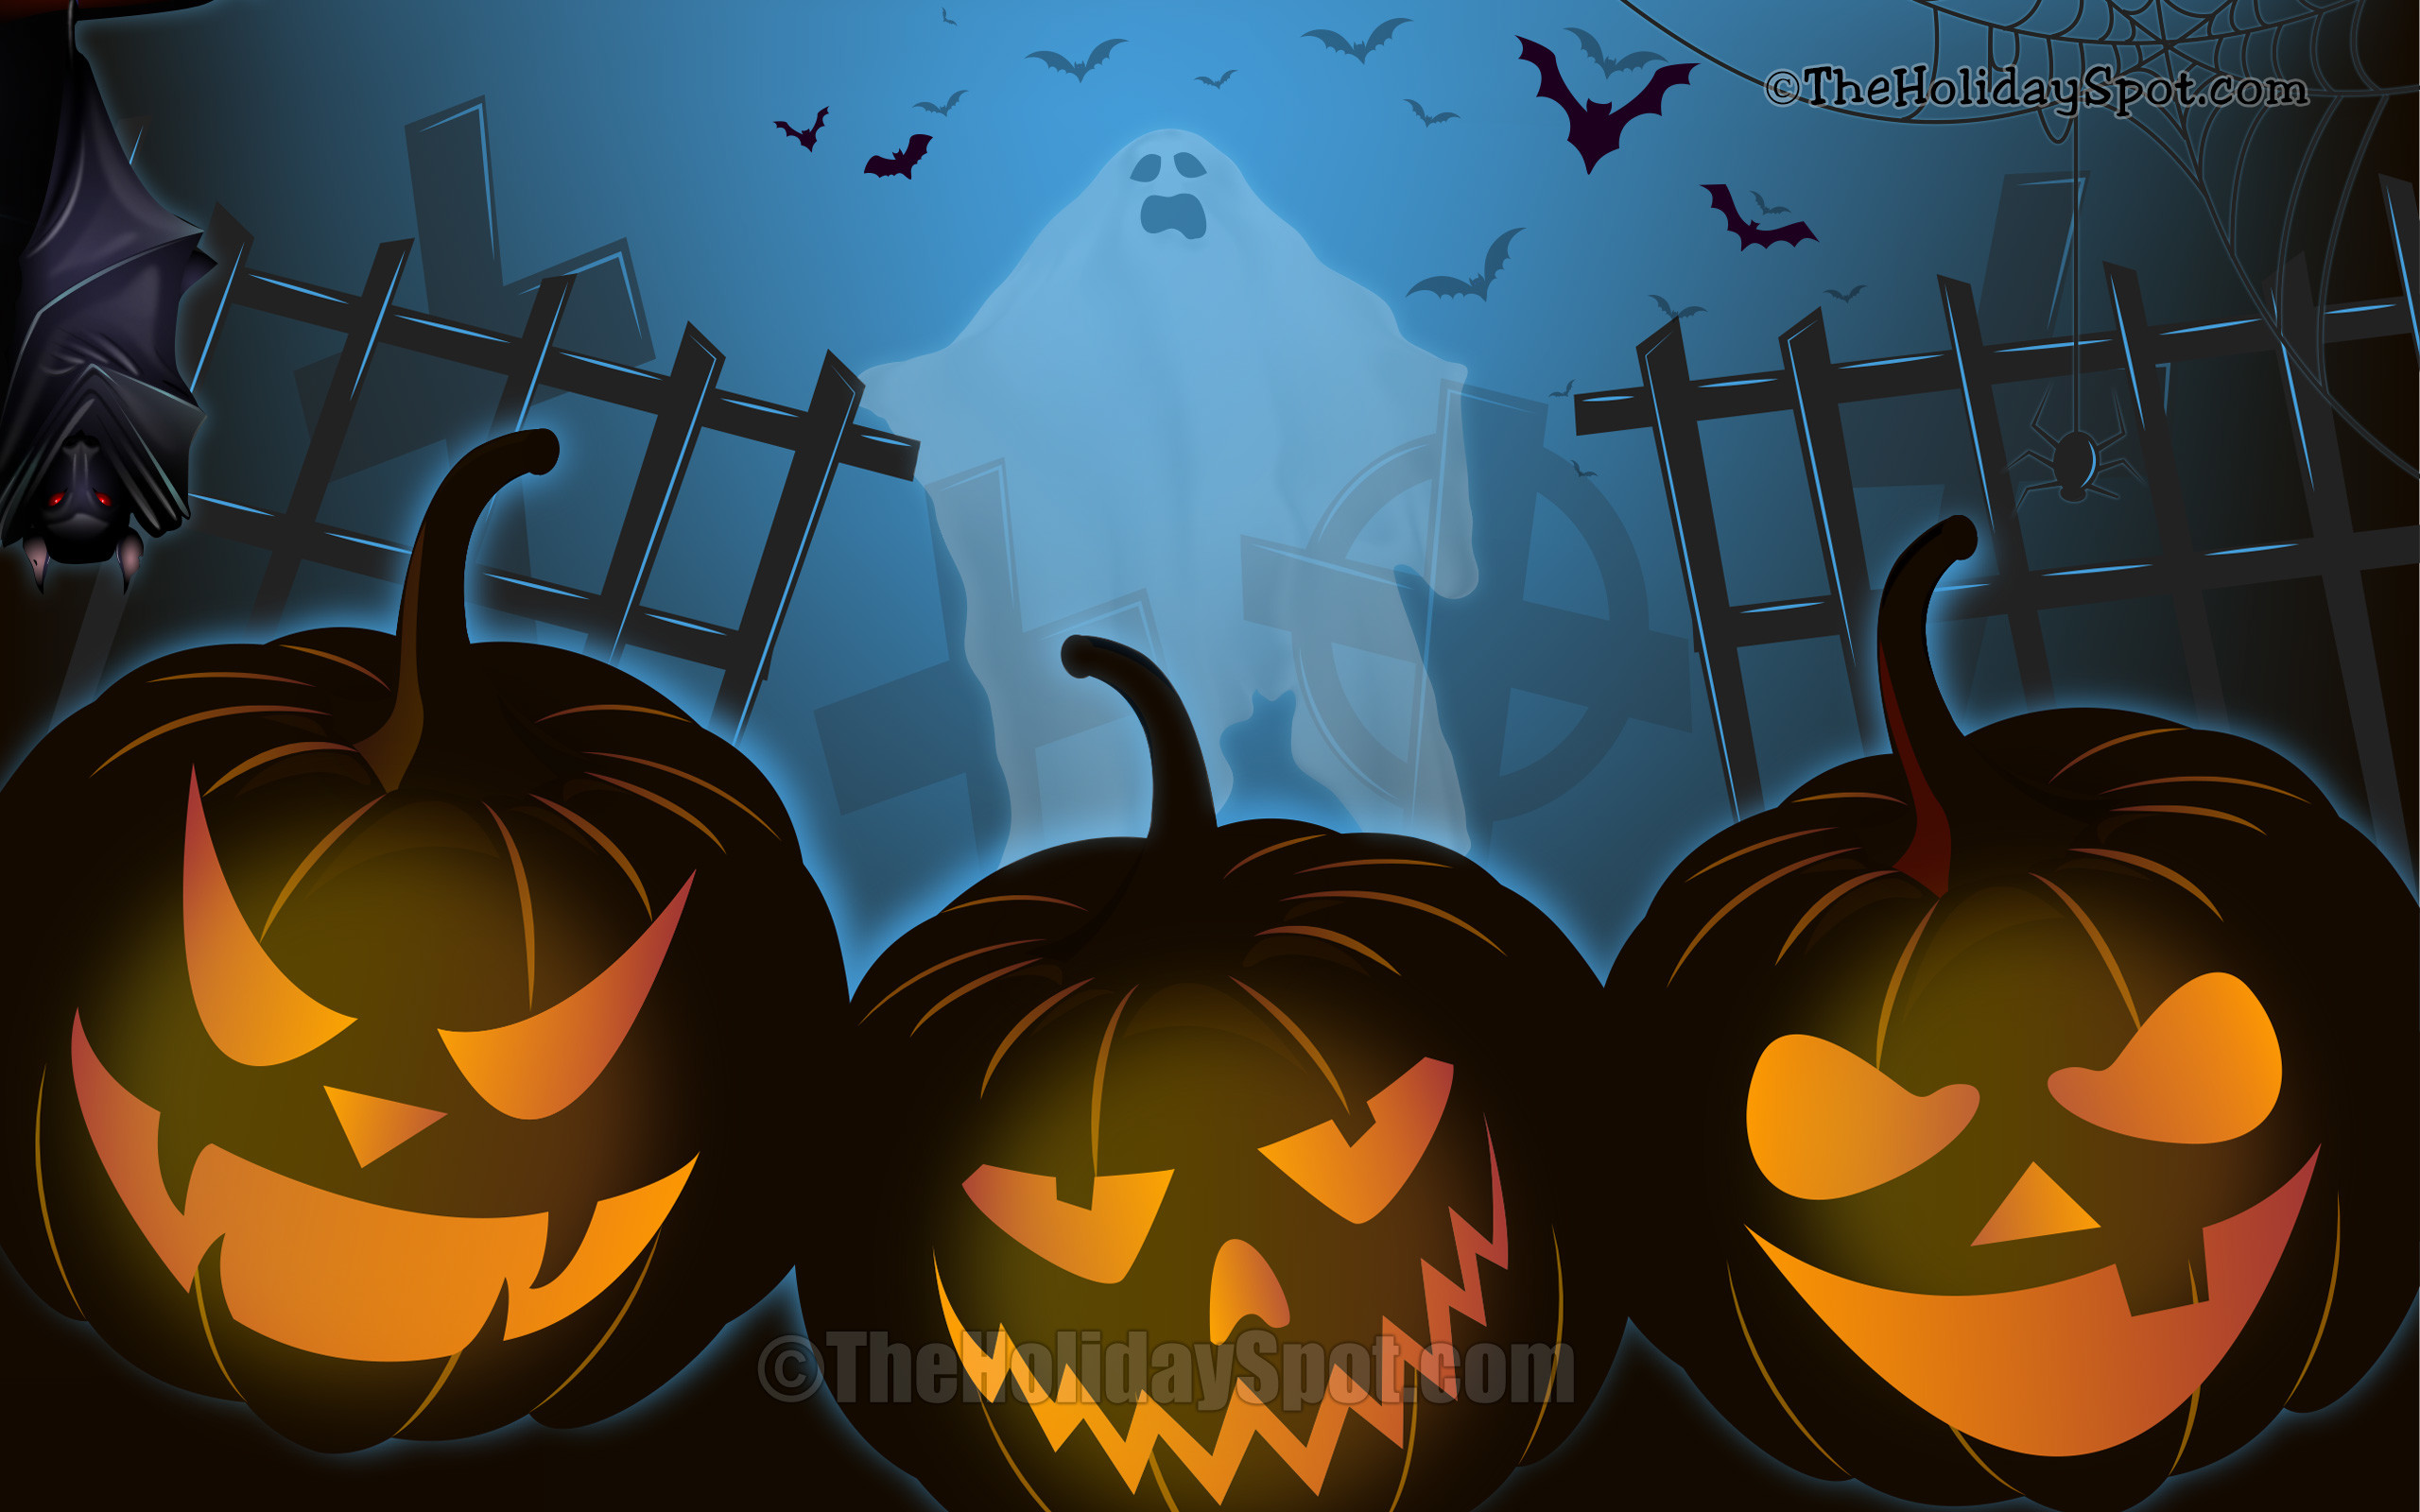 2560x1600 Wallpaper - Halloween Night with bat, pumpkins and ghost